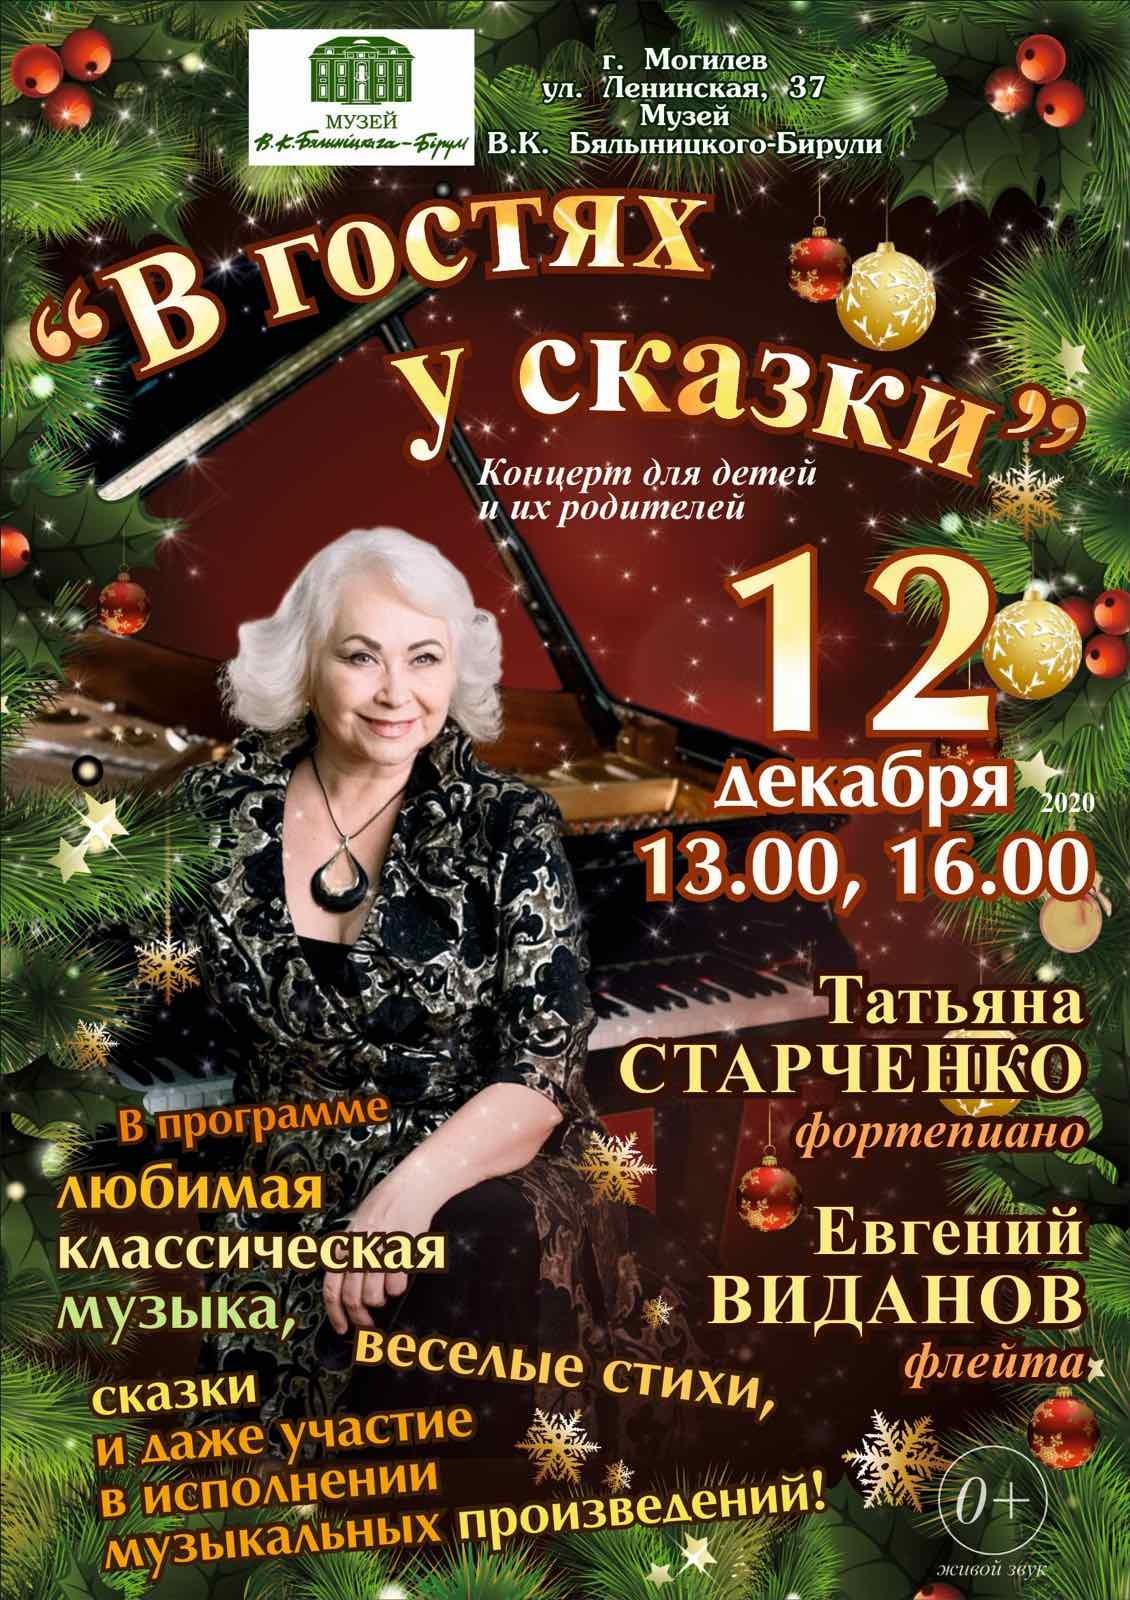 Могилевчан приглашают наконцерт «Вгостях усказки»